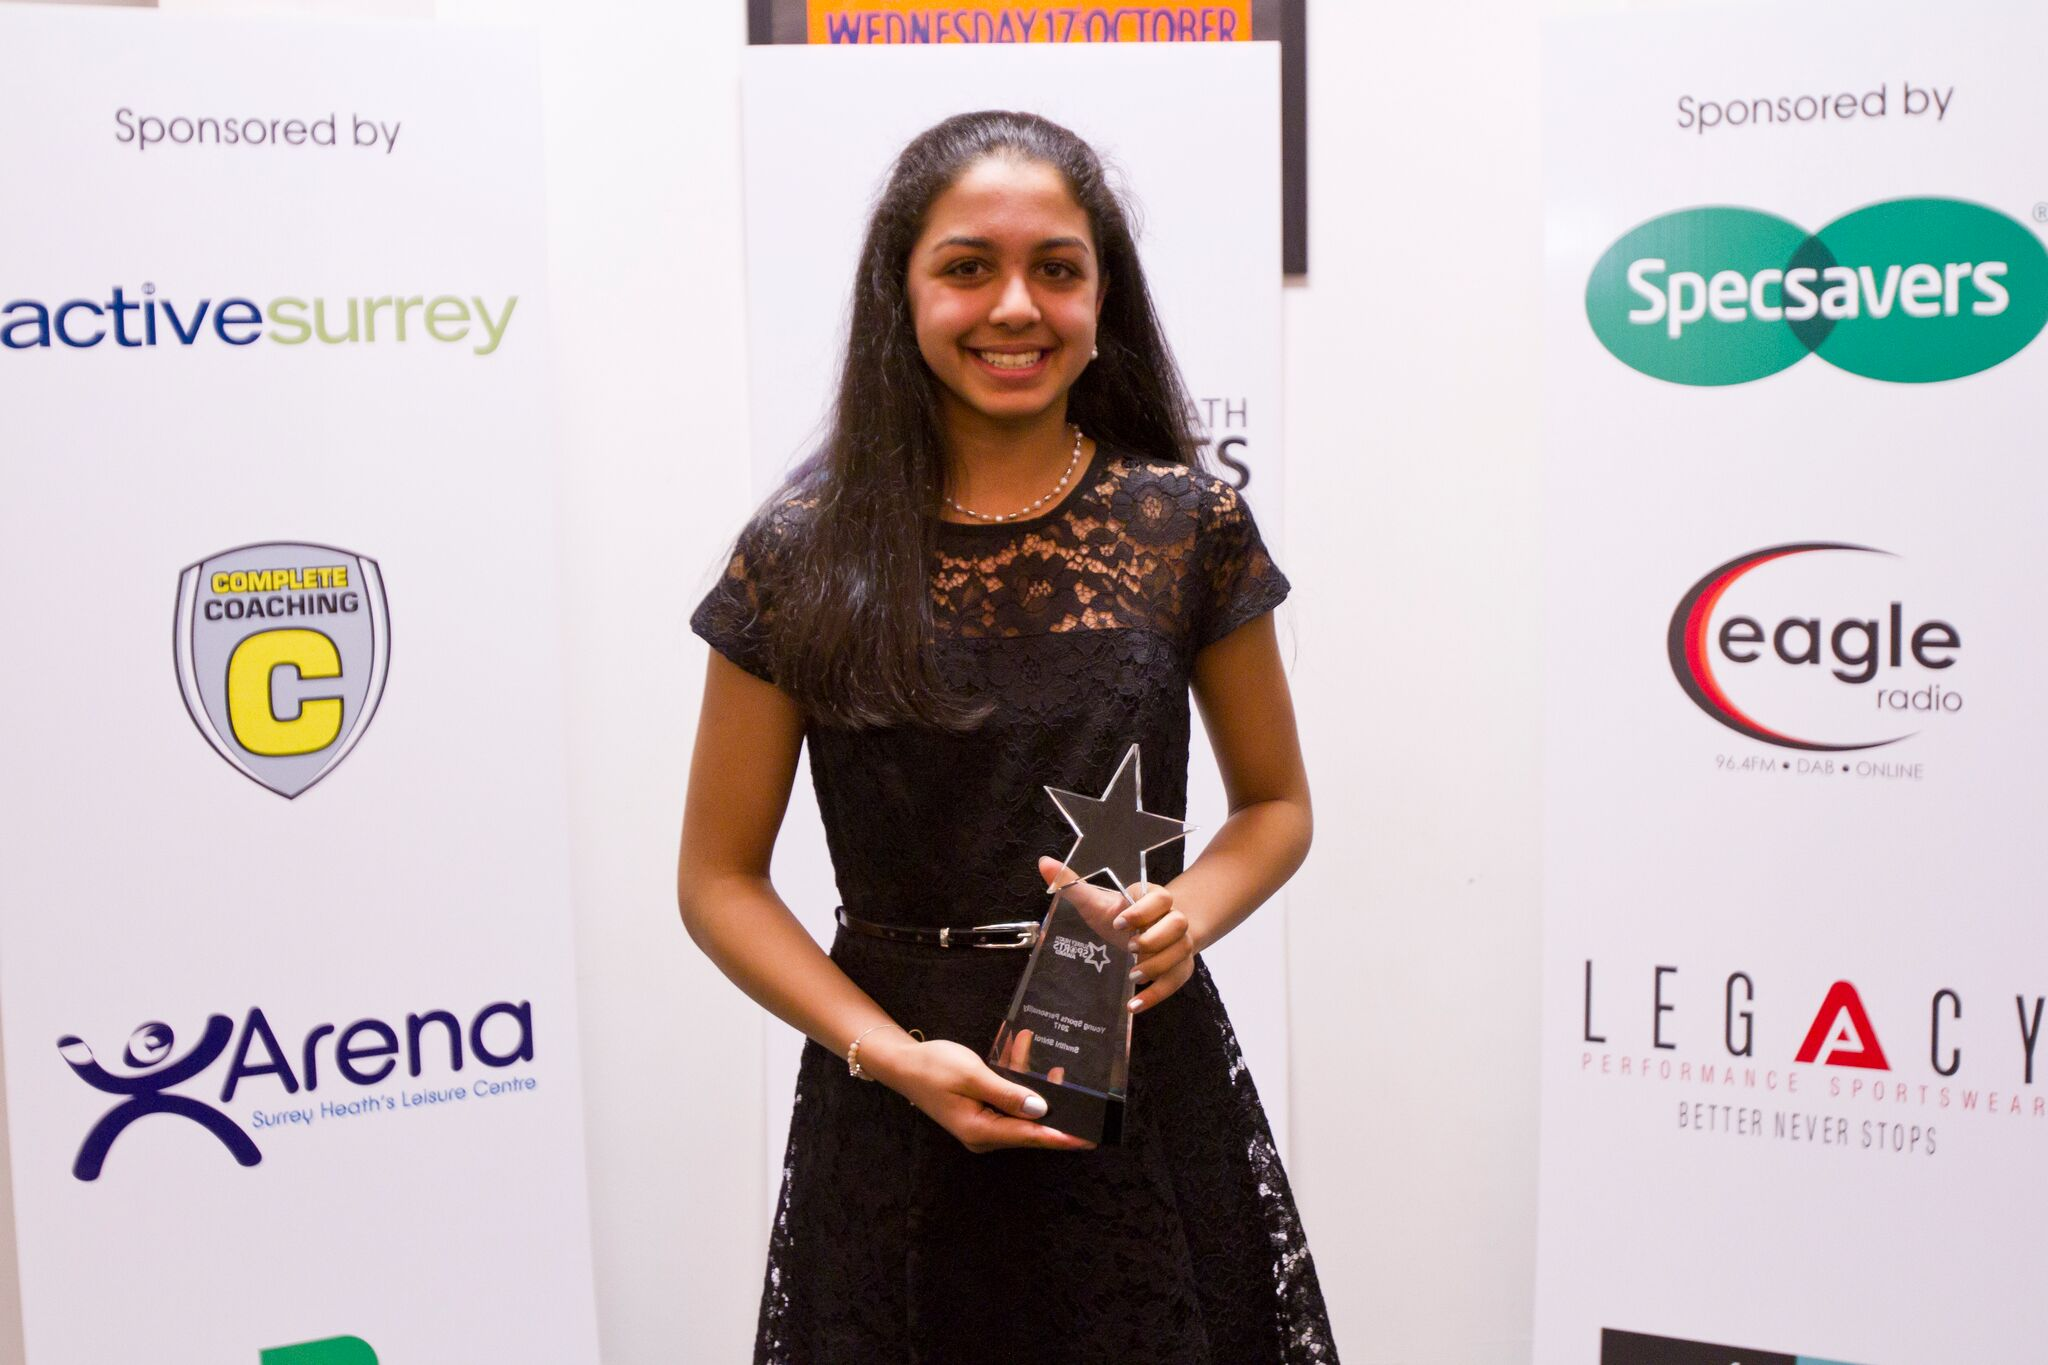 Specsavers Club of the Year - Bagshot Tennis Club 2017